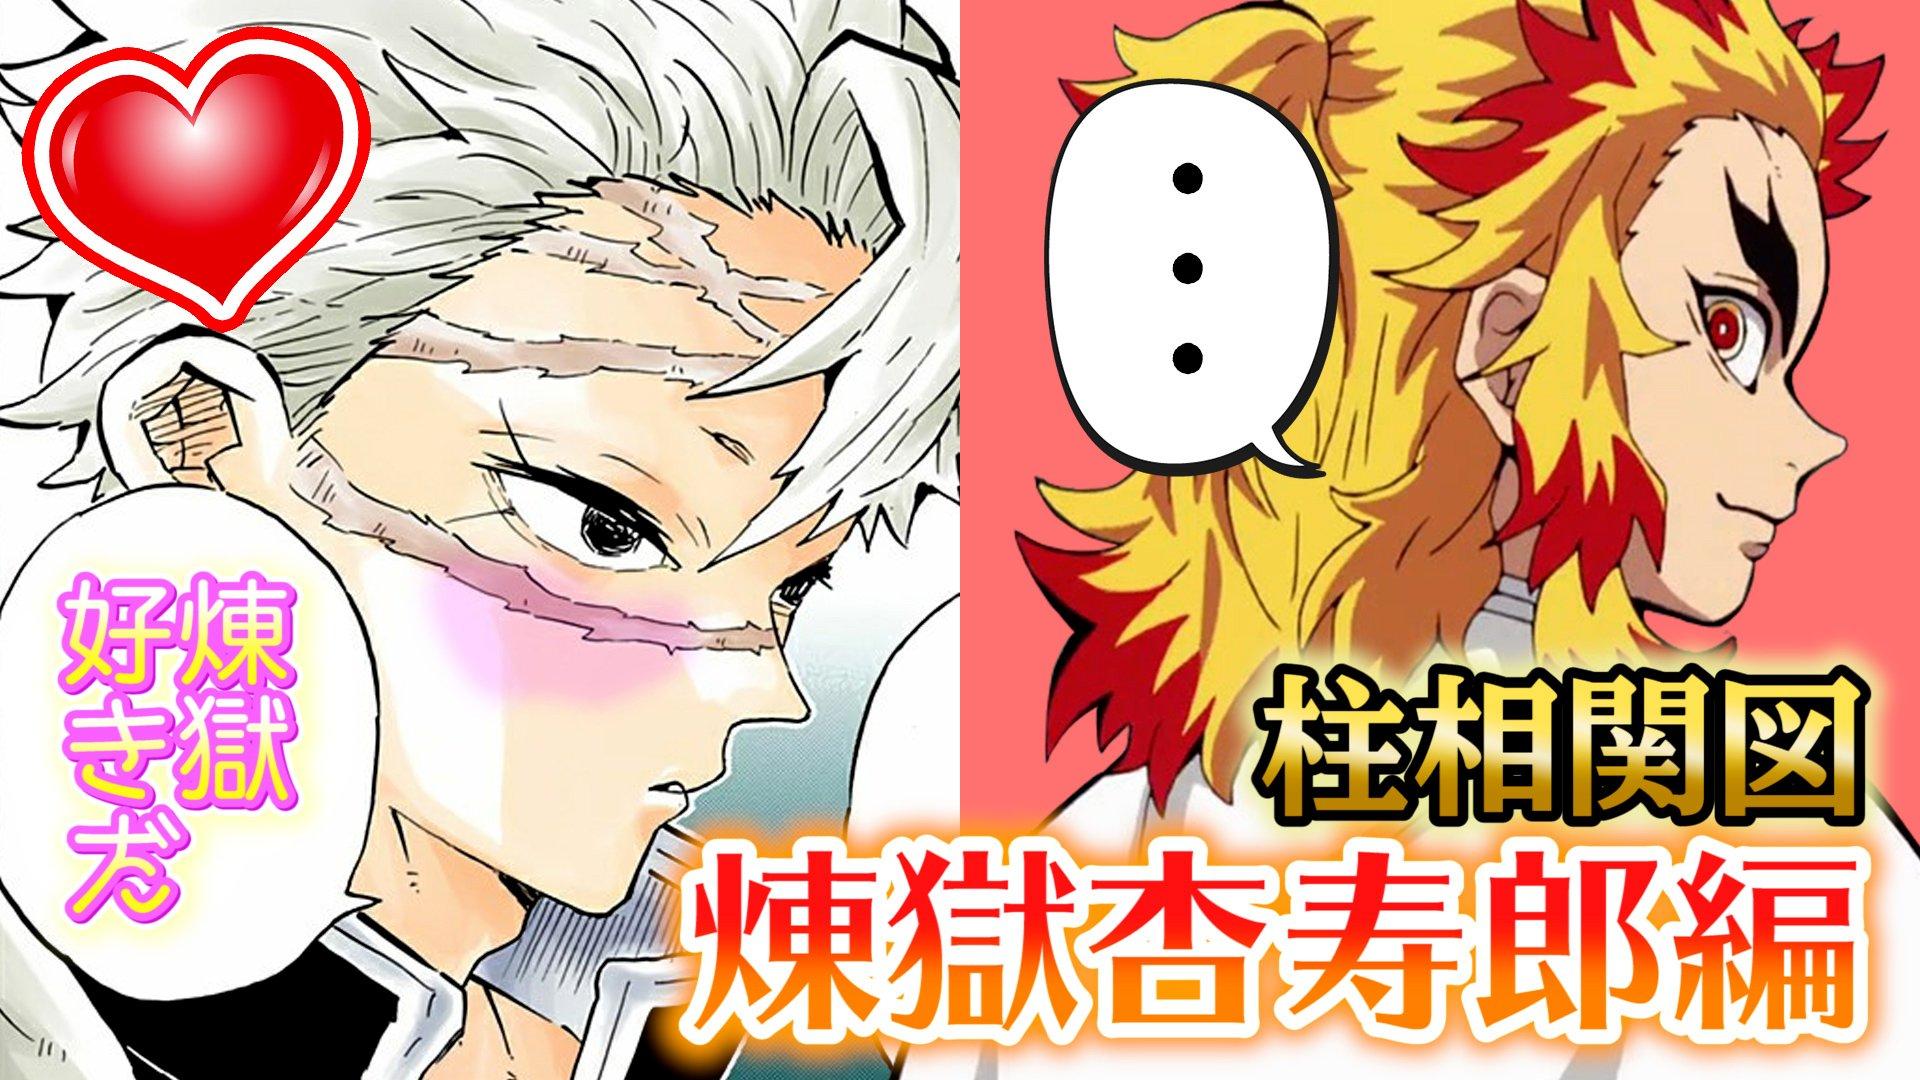 鬼滅の刃 煉獄杏寿郎